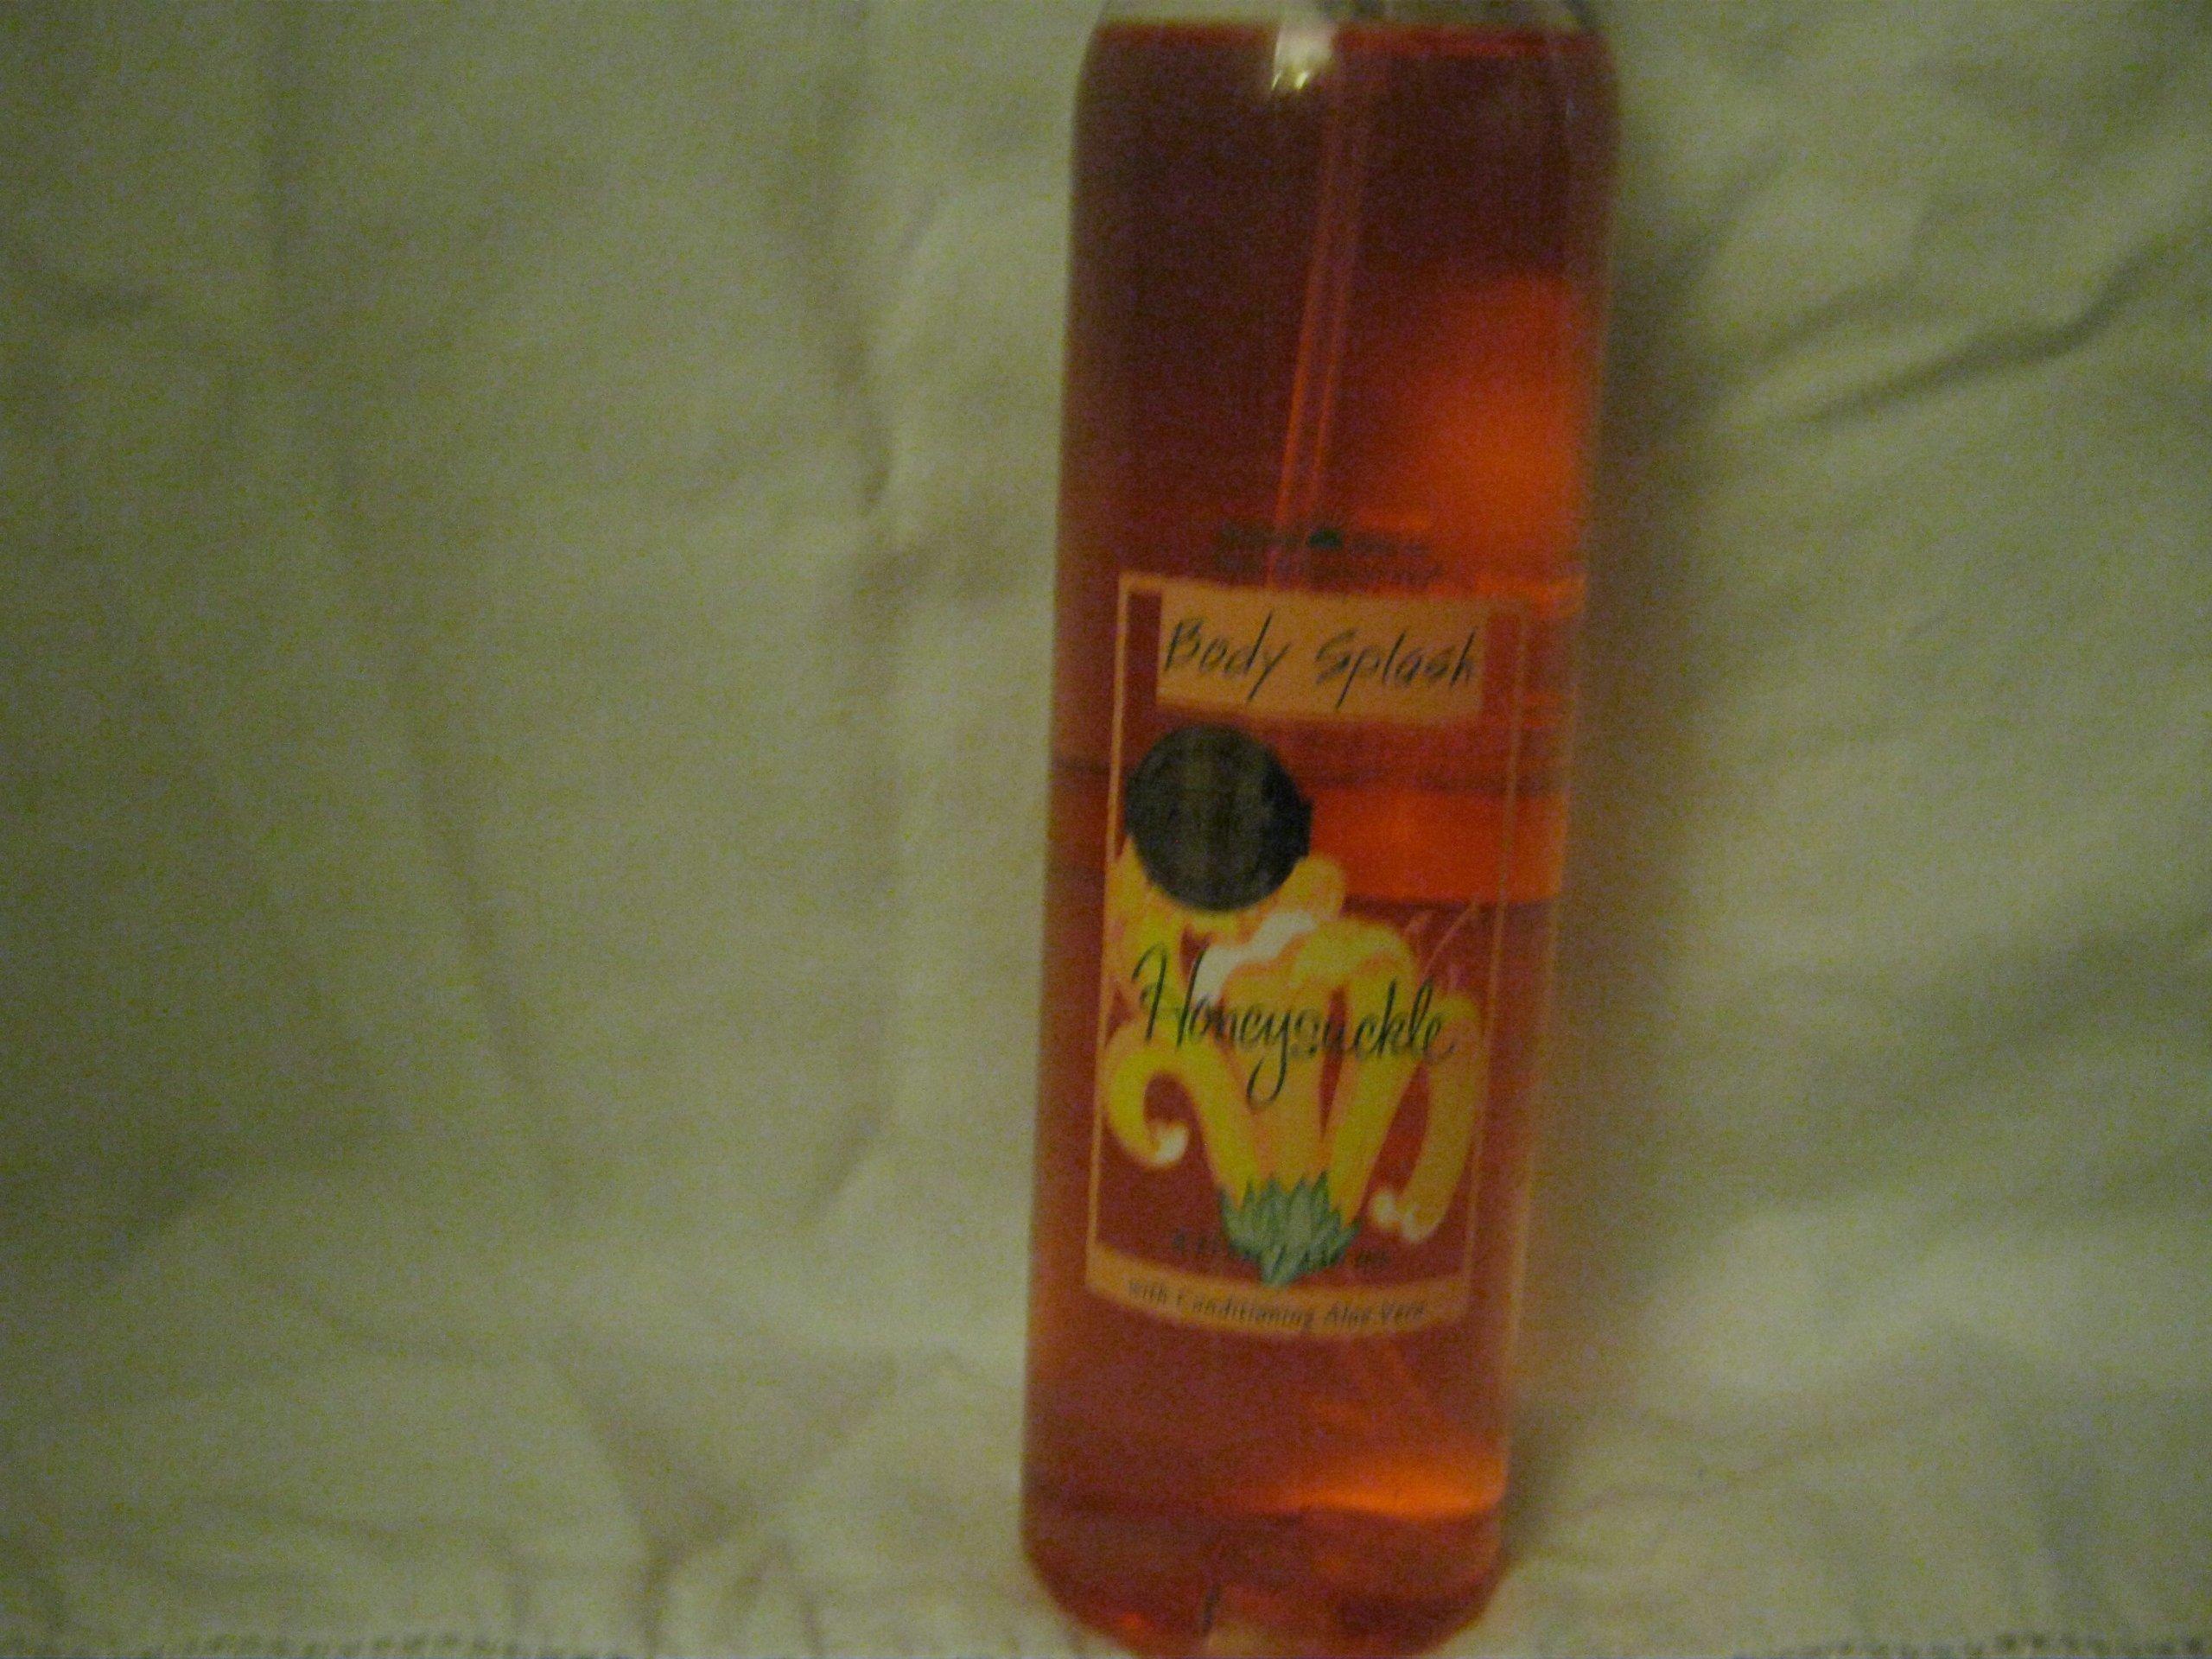 Bath & Body Works Original Honeysuckle Body Splash Rare & Discontinued!